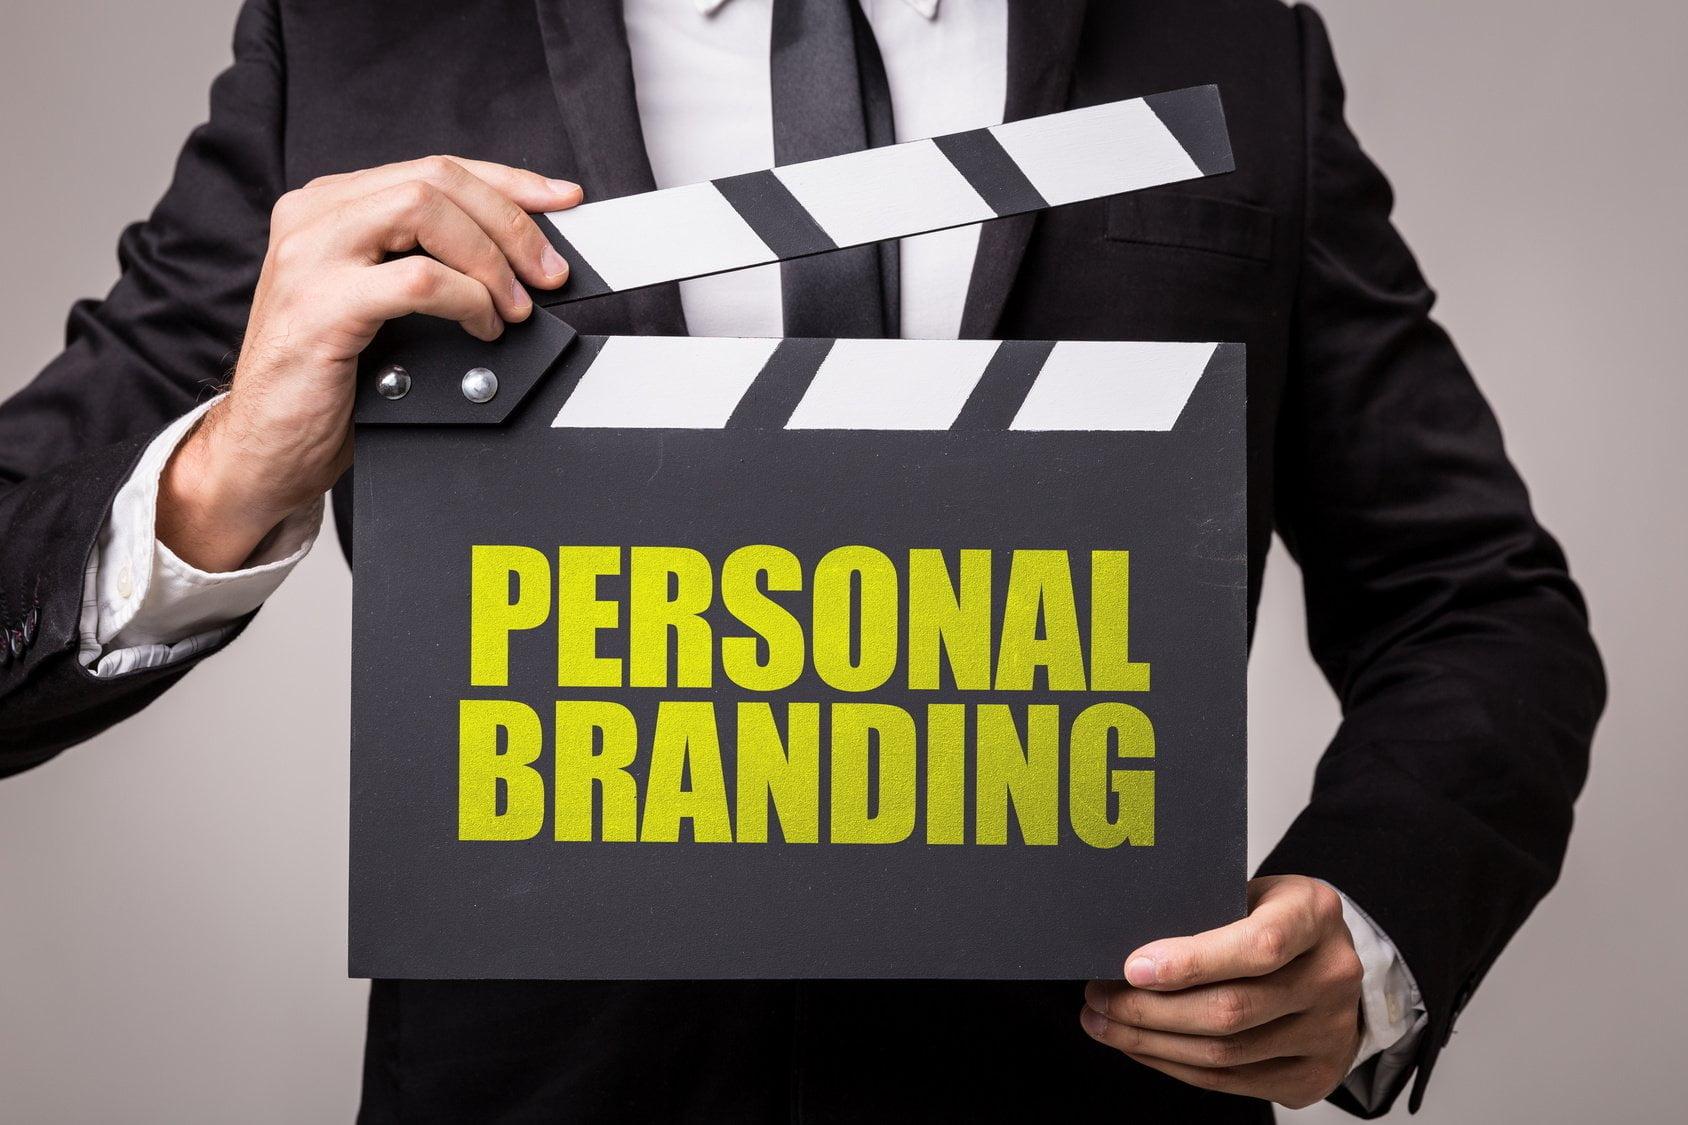 5 Personal Branding Hacks Every Entrepreneur Should Know